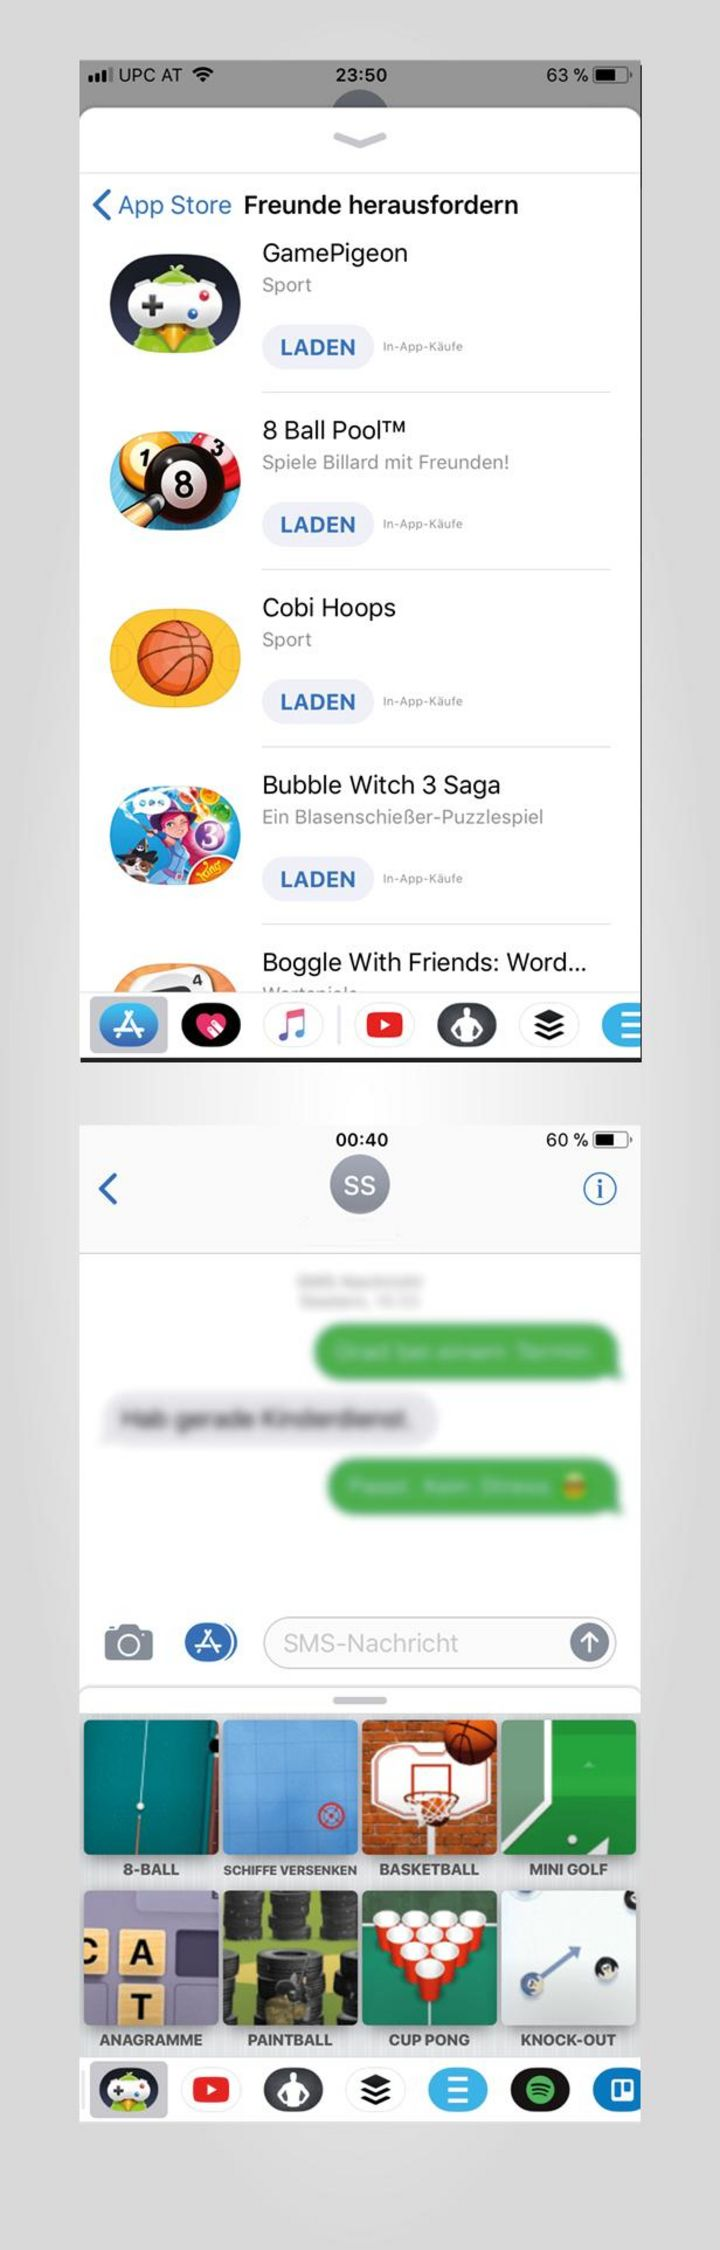 Über Apples Messenger-App kann man mit Freunden coole Games spielen.